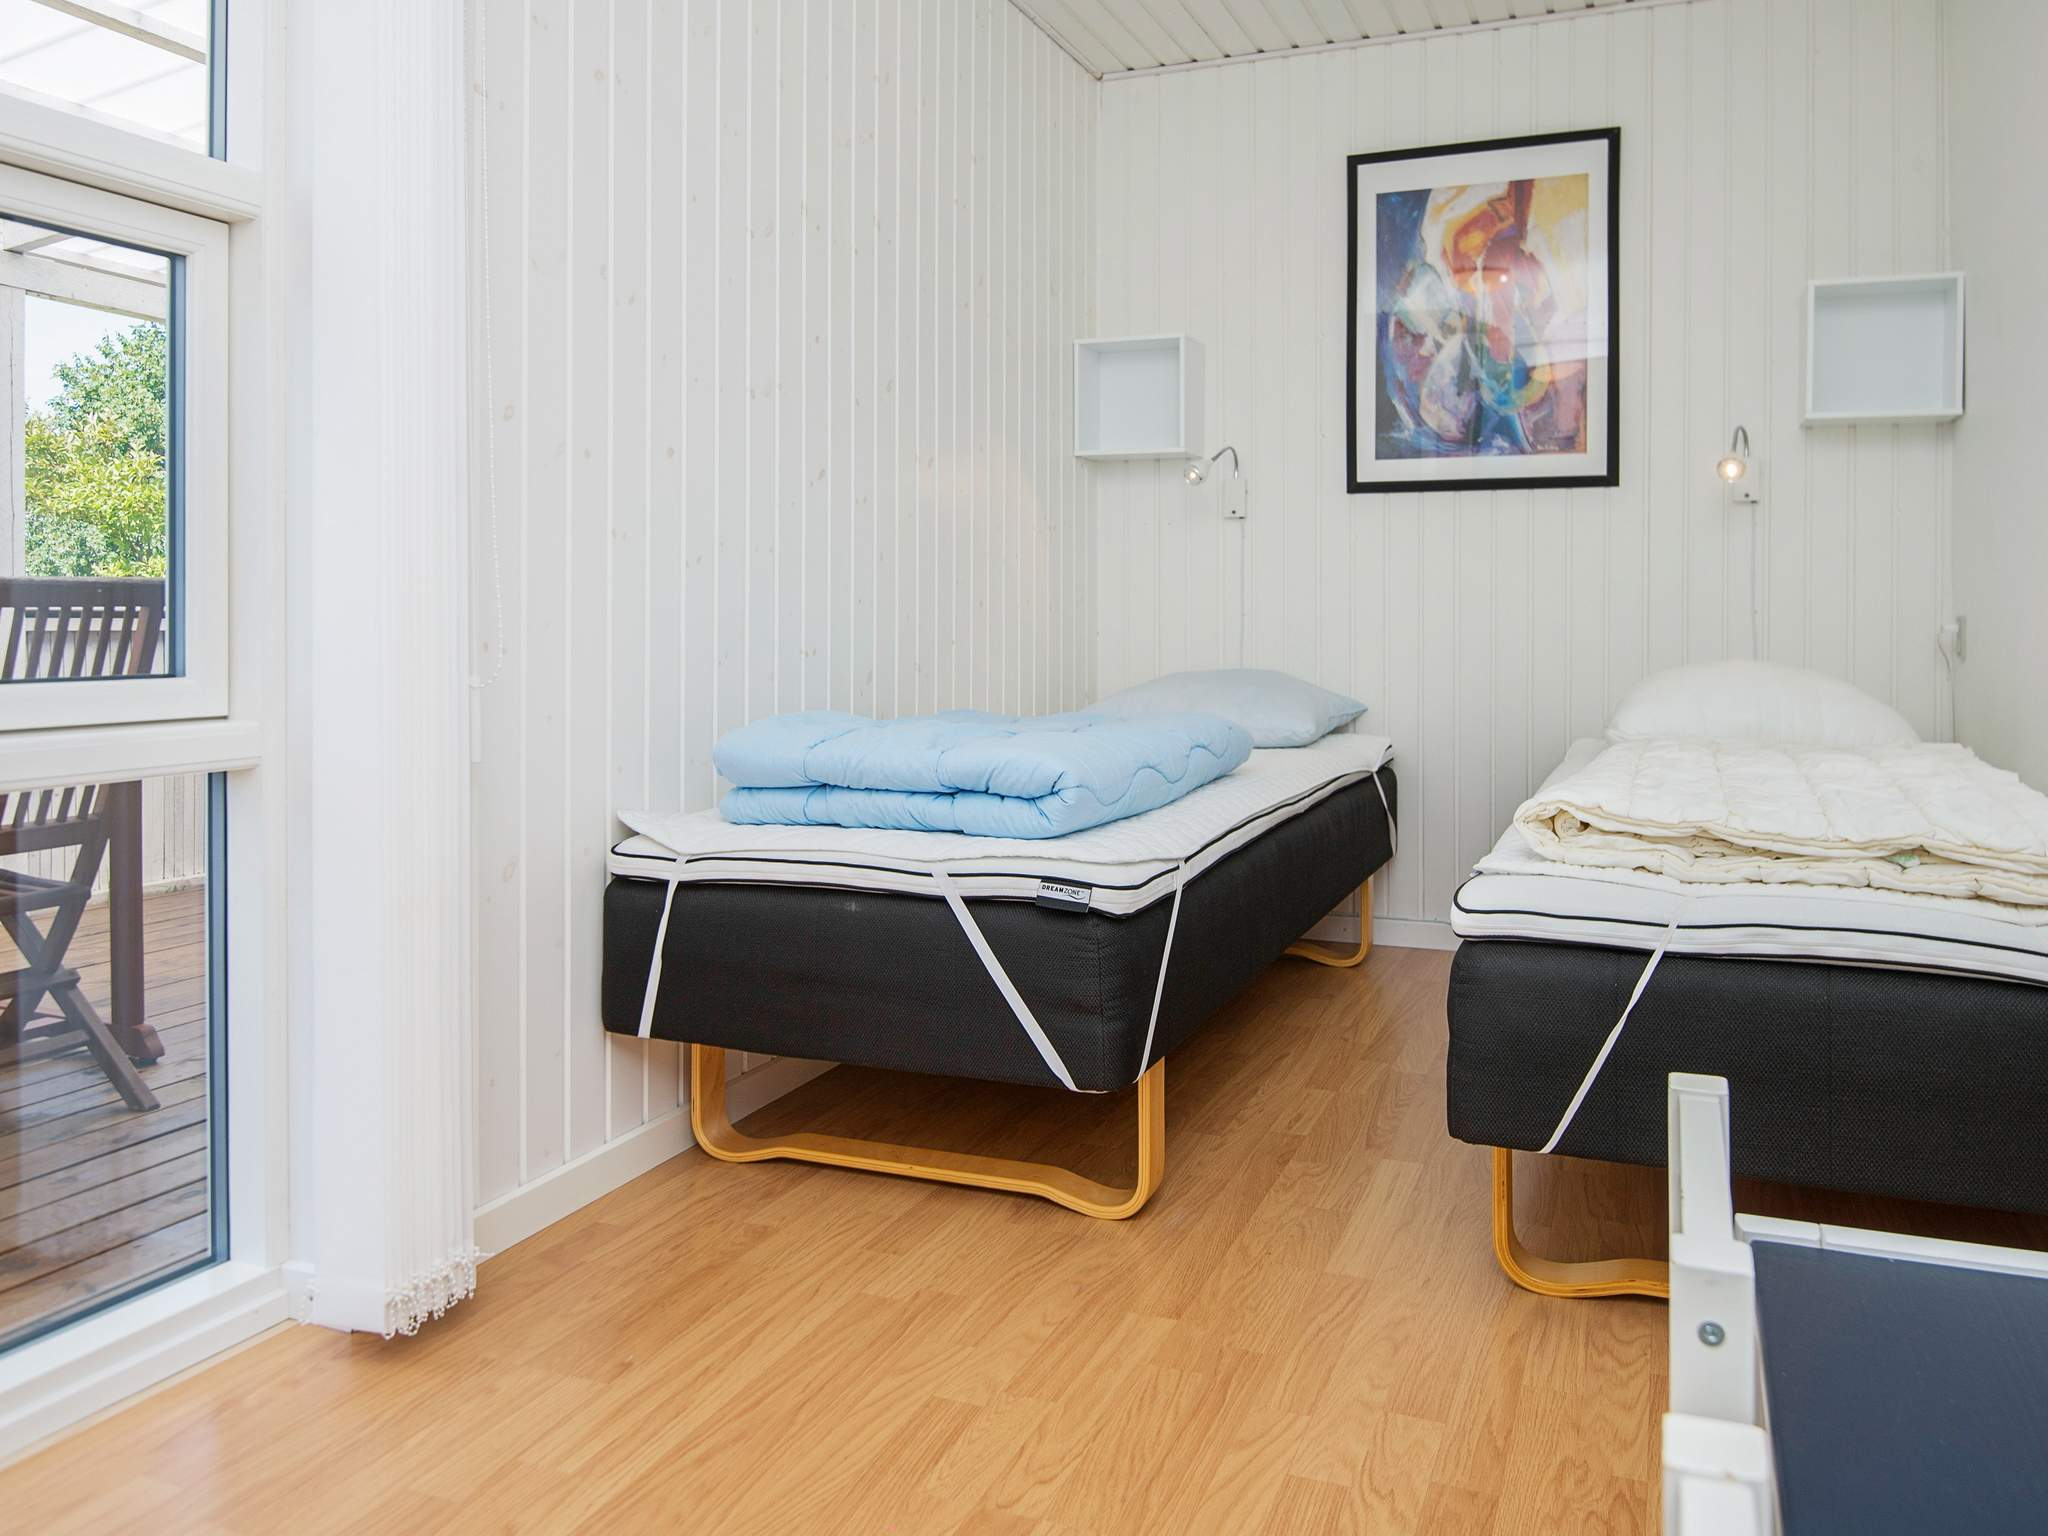 Maison de vacances Helgenæs (978615), Knebel, , Jutland Est, Danemark, image 9